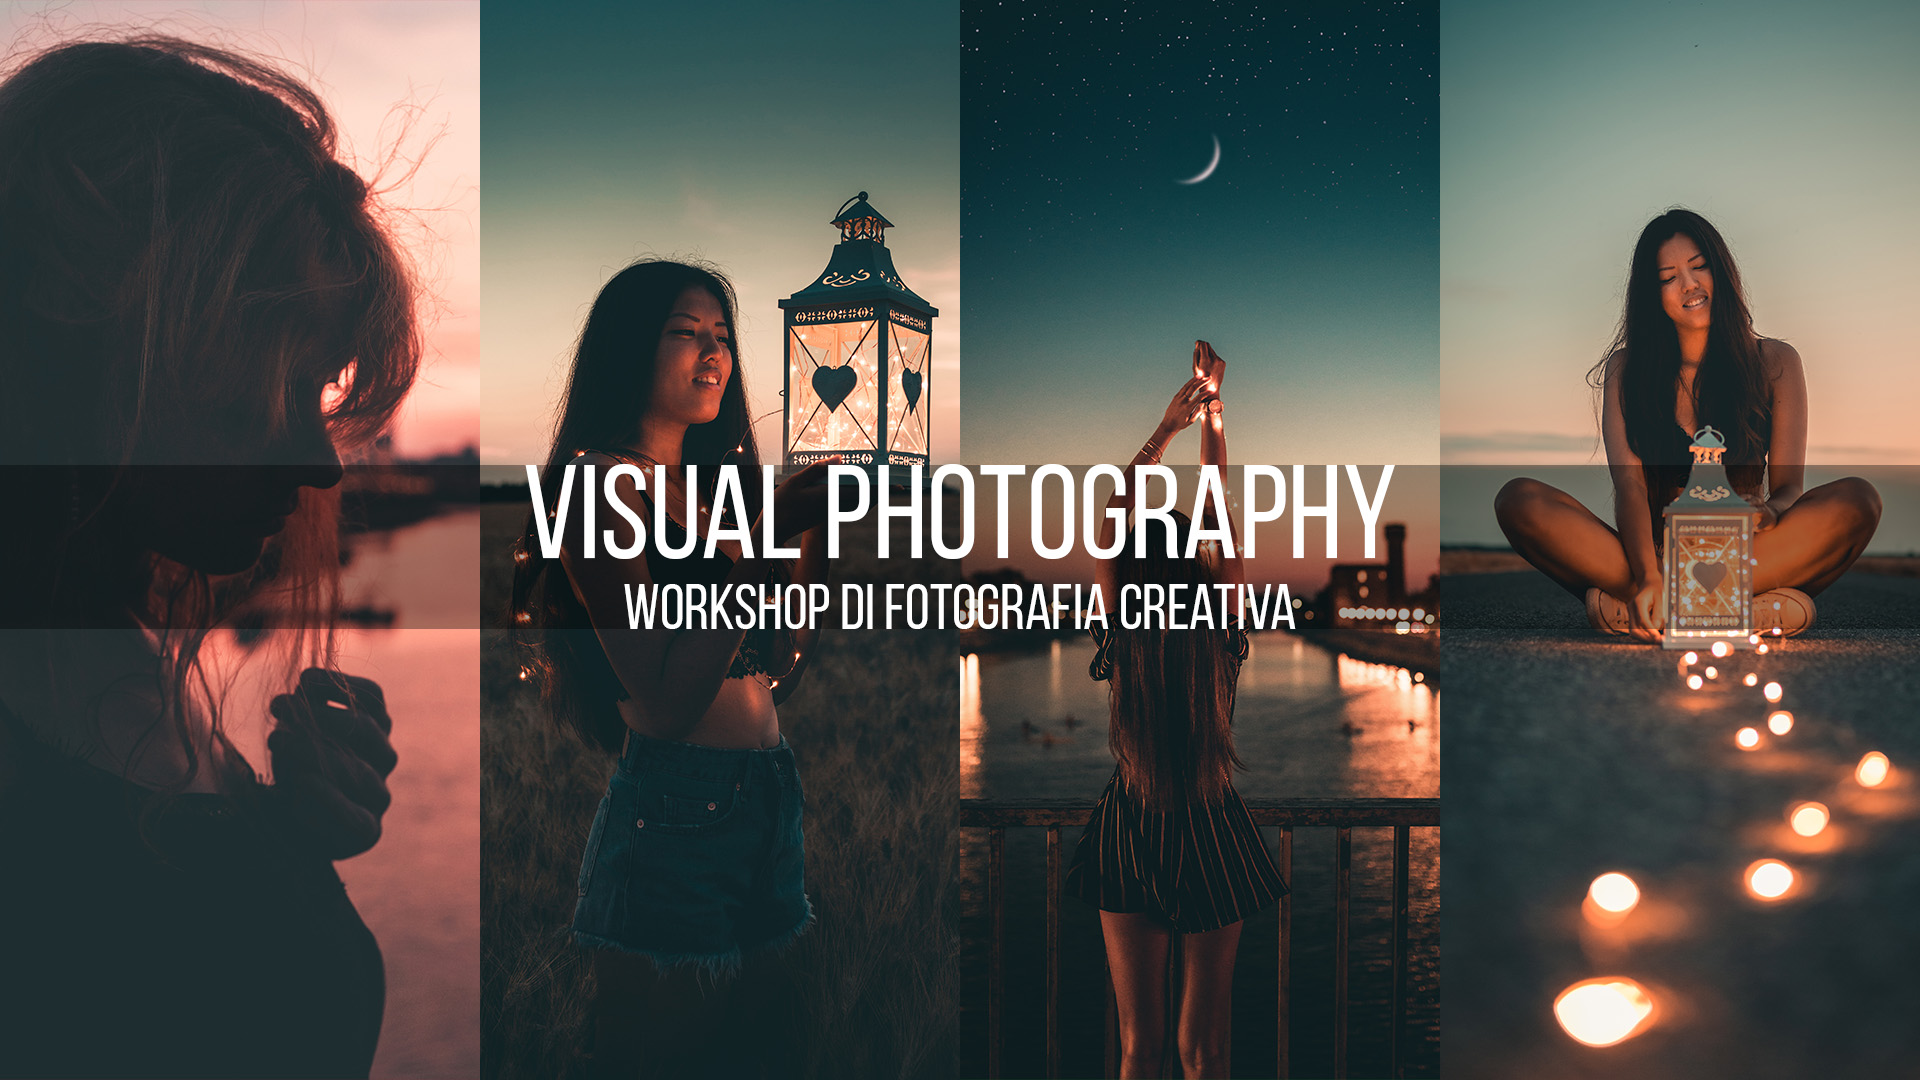 Workshop Visual Photography & Fotografia Creativa – 11 Novembre 2017